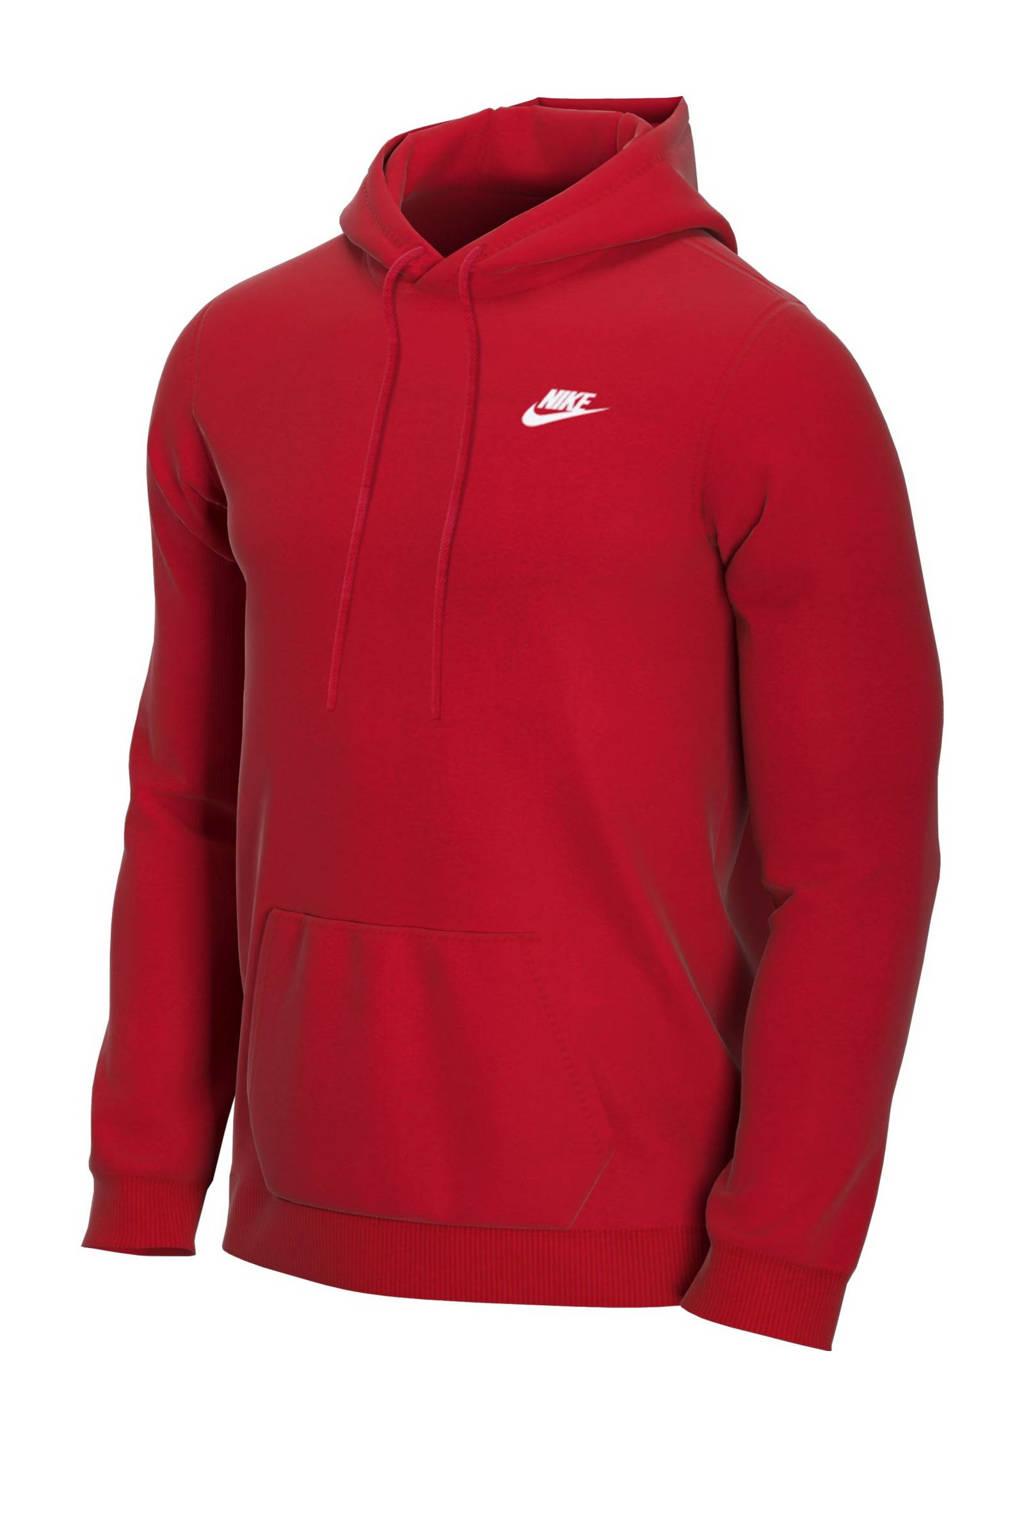 Nike hoodie rood/wit, Rood/wit